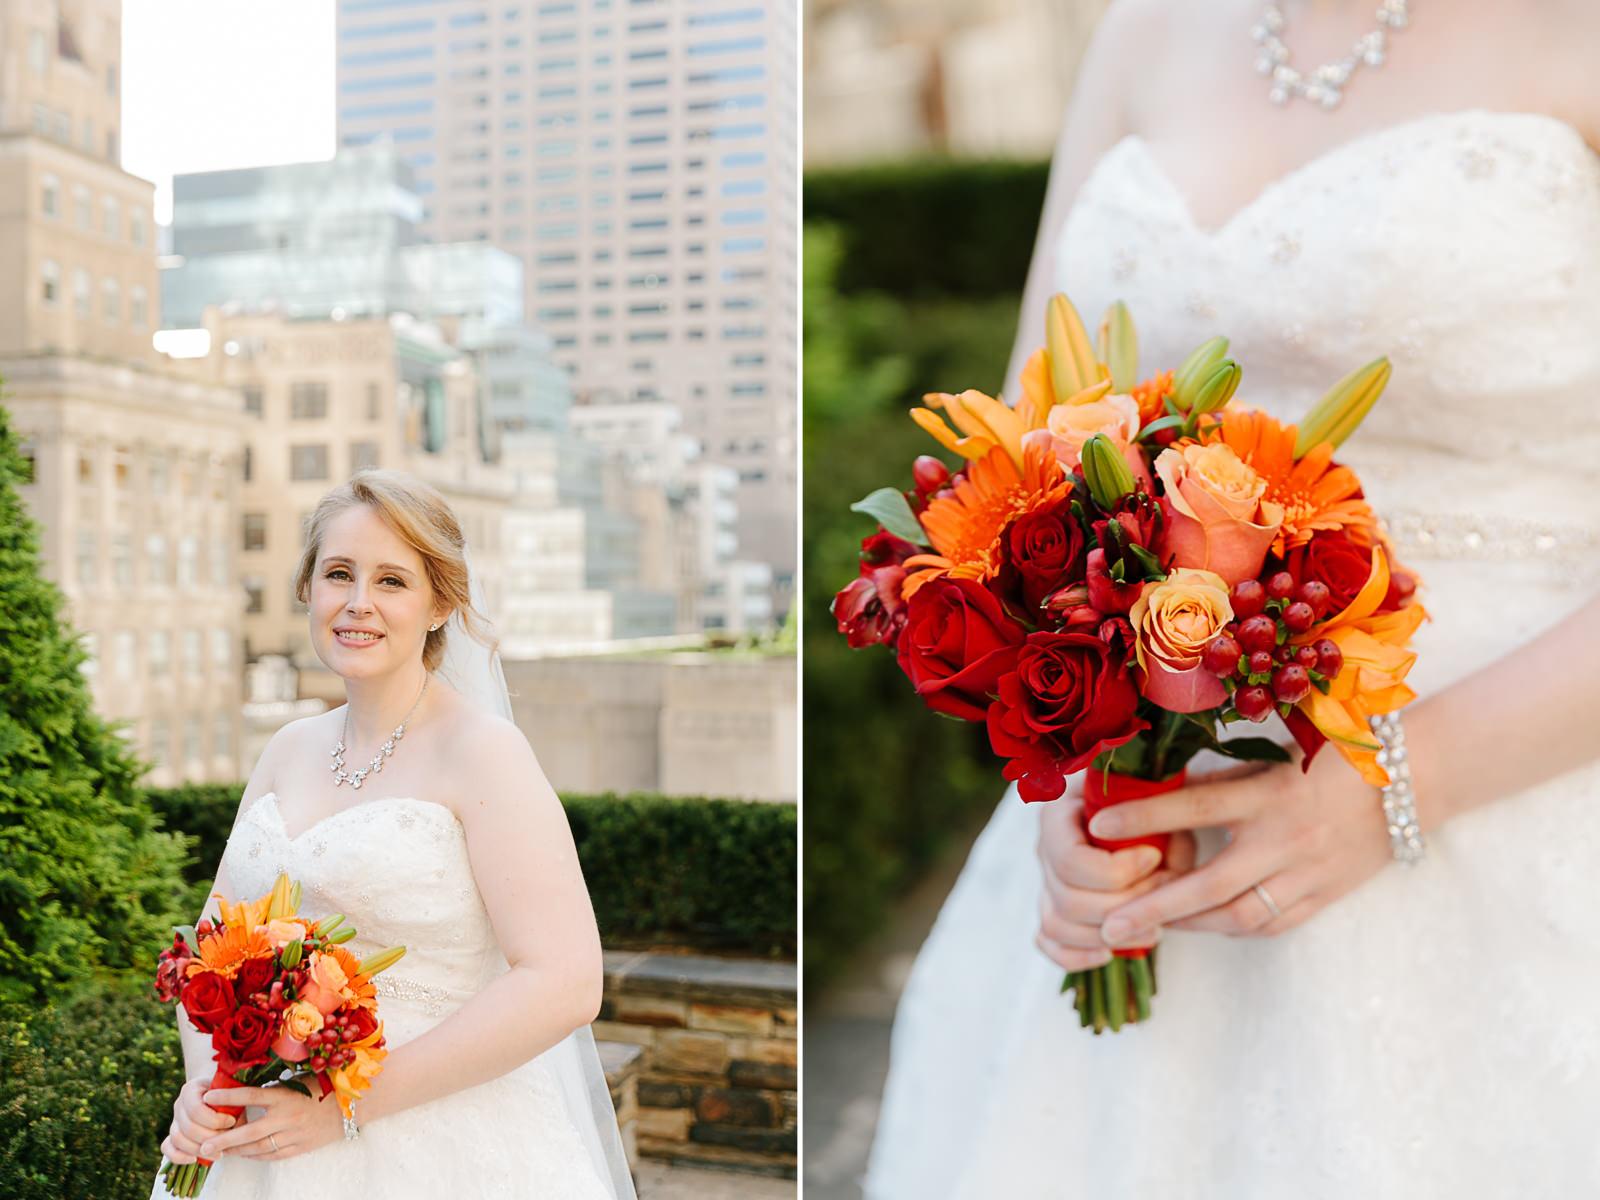 620 Loft&garden-intimate-wedding-12.jpg